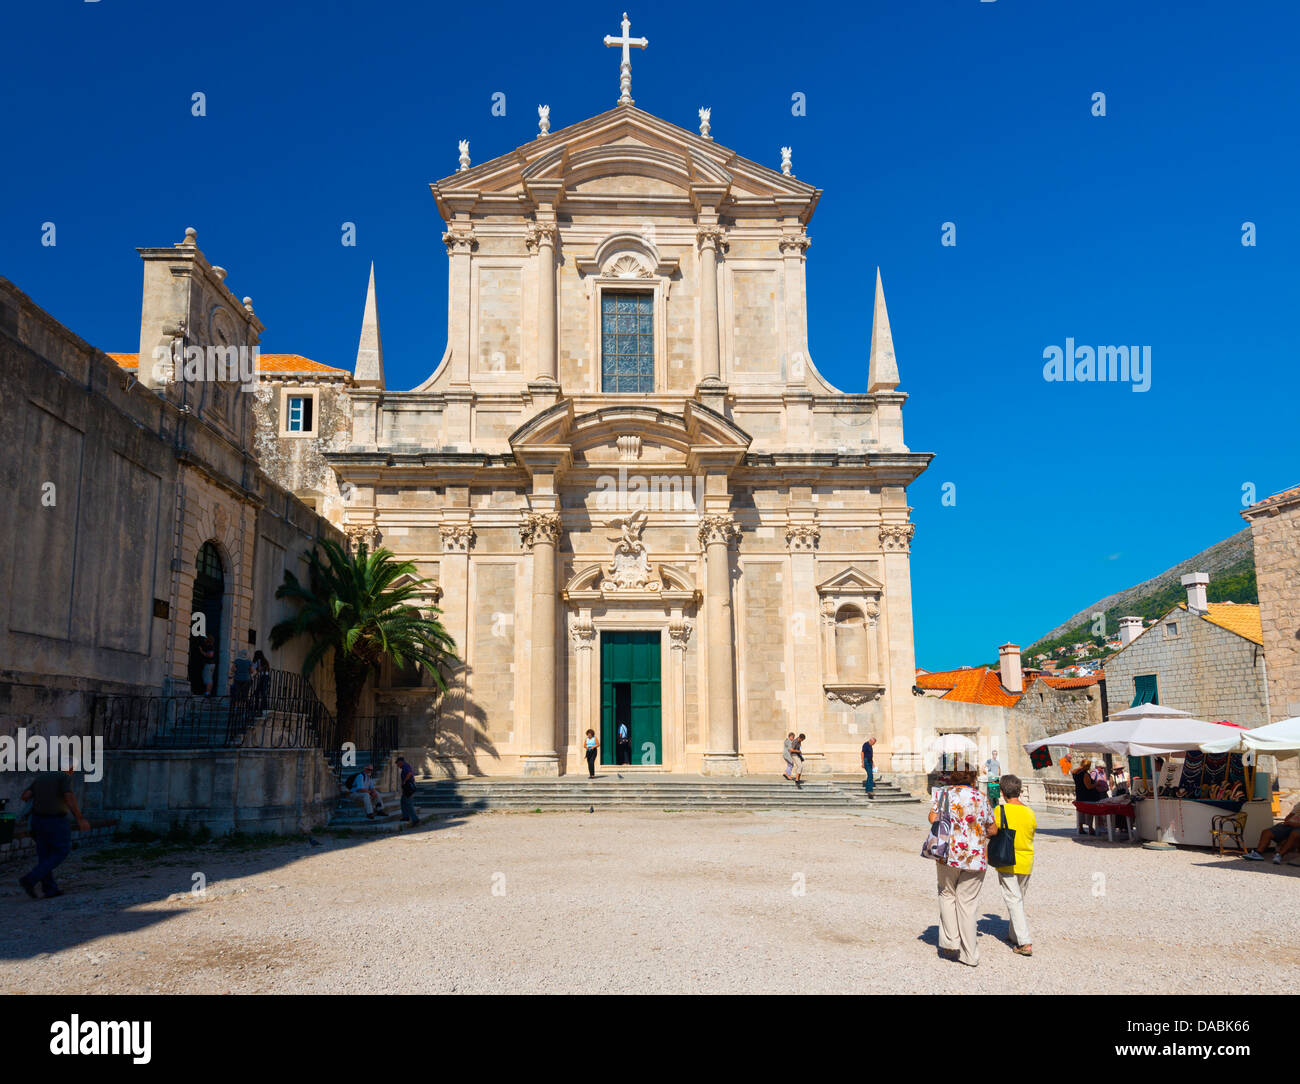 Jesuit Church of St. Ignatius of Loyola, Old Town (Stari Grad), Dubrovnik, Dalmatia, Croatia, Europe - Stock Image